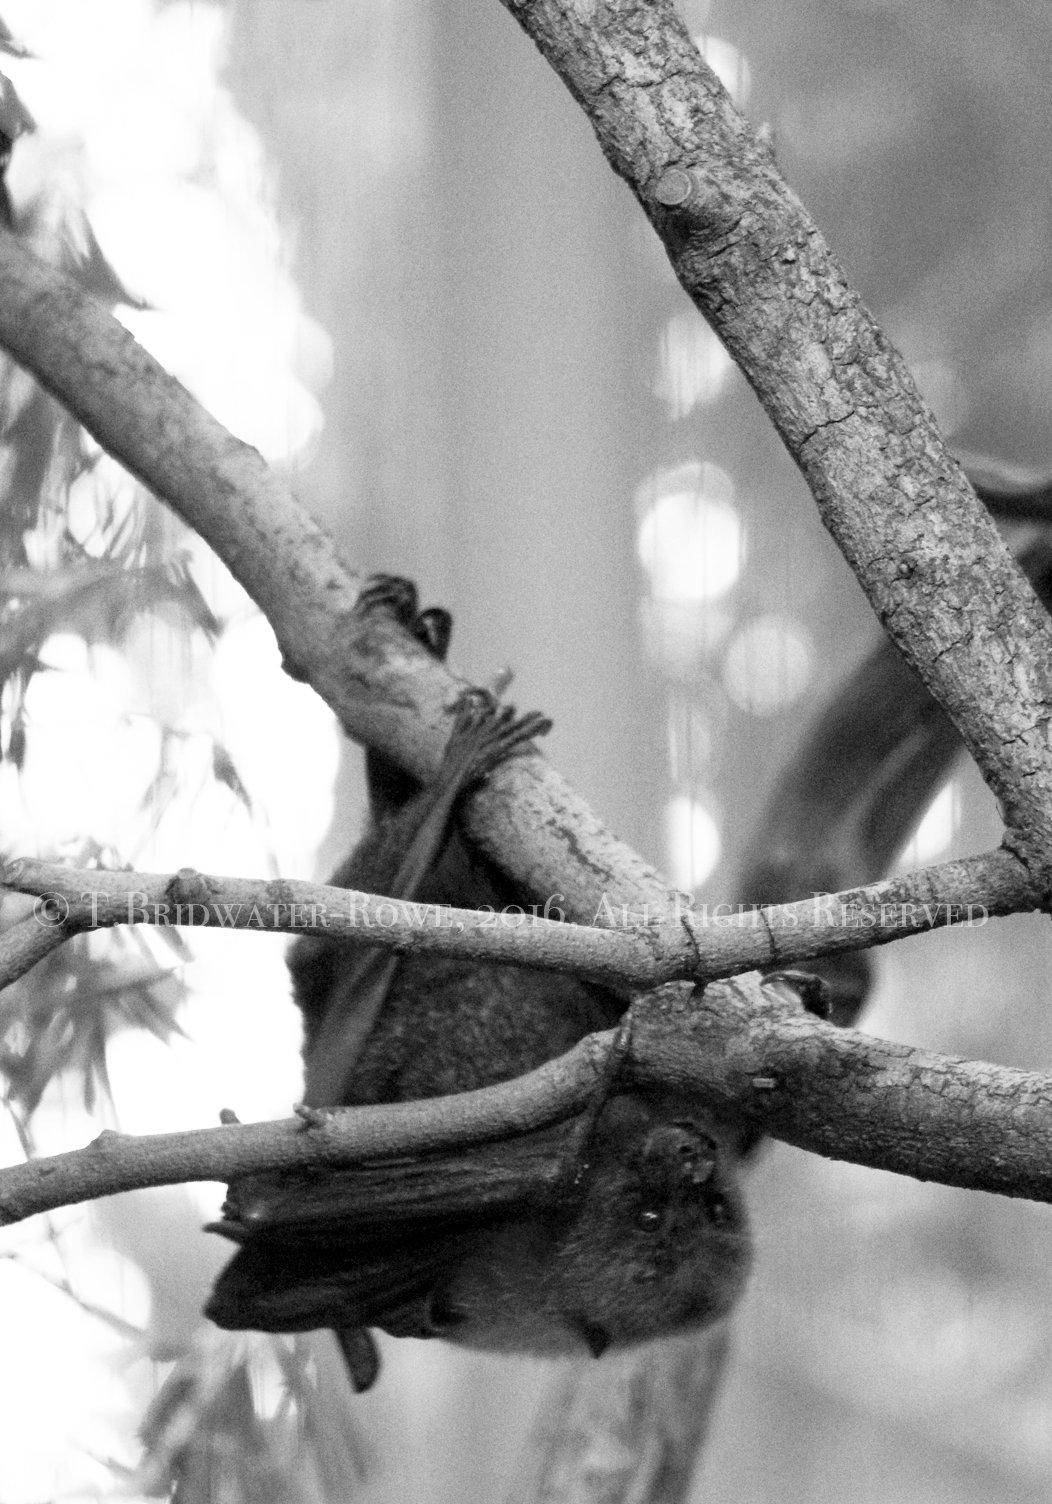 16x20 Art on Canvas, Bat Art, Nature Photography, Wildlife Photography, Art on Canvas, Cute Bat Print, Animal Print, Black and White Home Decor, Wildlife, Bat Photograph on Canvas, Canvas Wall Art